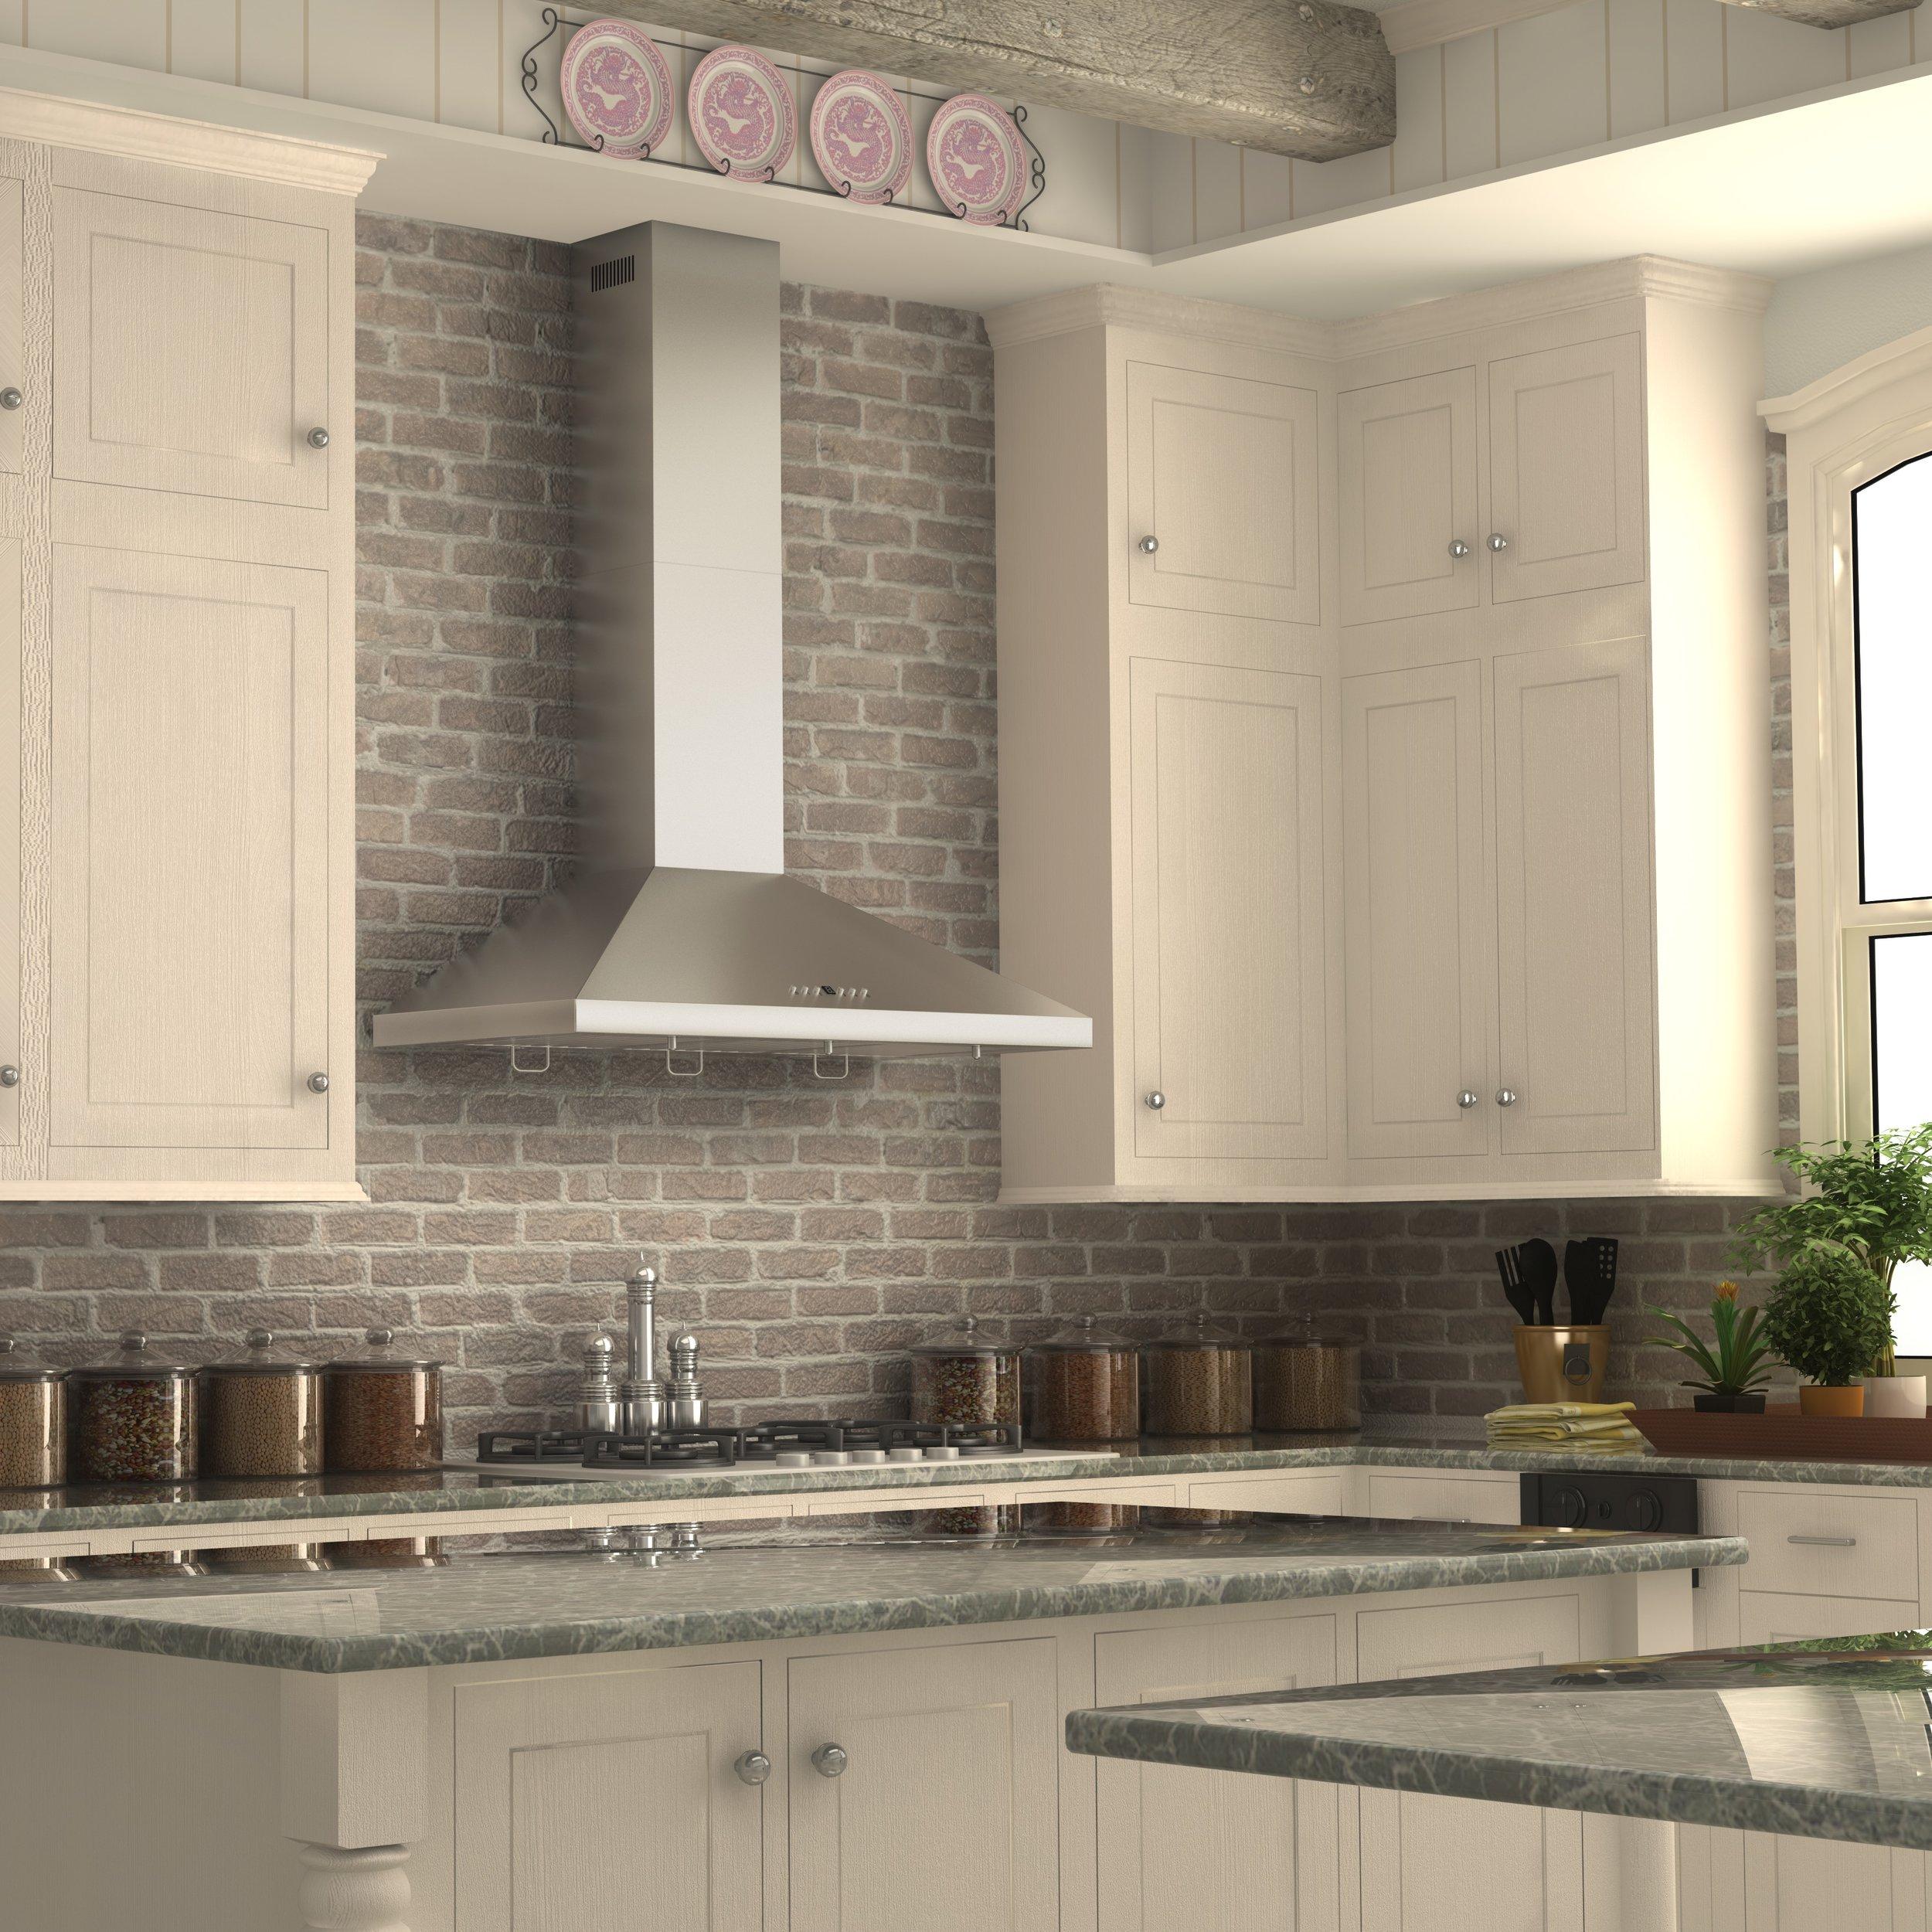 zline-stainless-steel-wall-mounted-range-hood-KL2-kitchen.jpeg